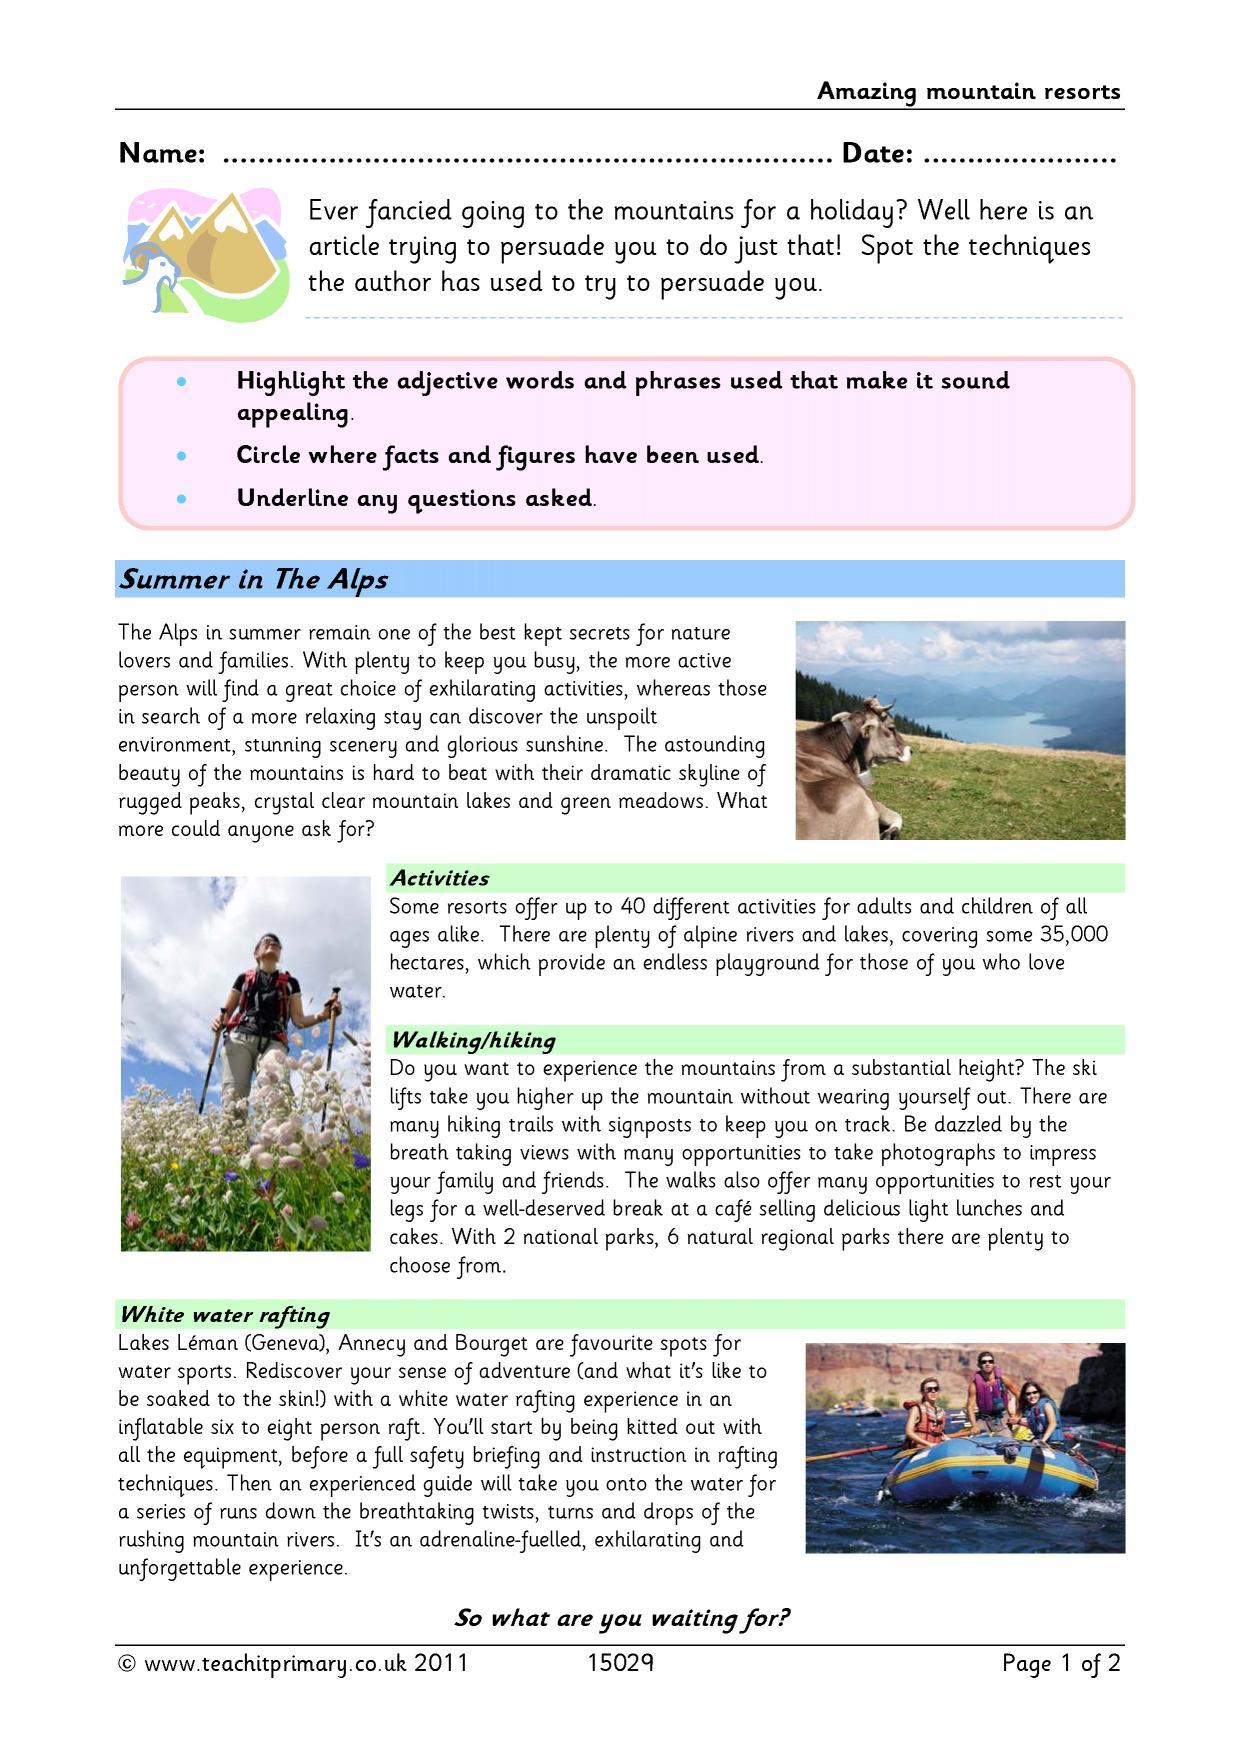 Design a Travel Brochure